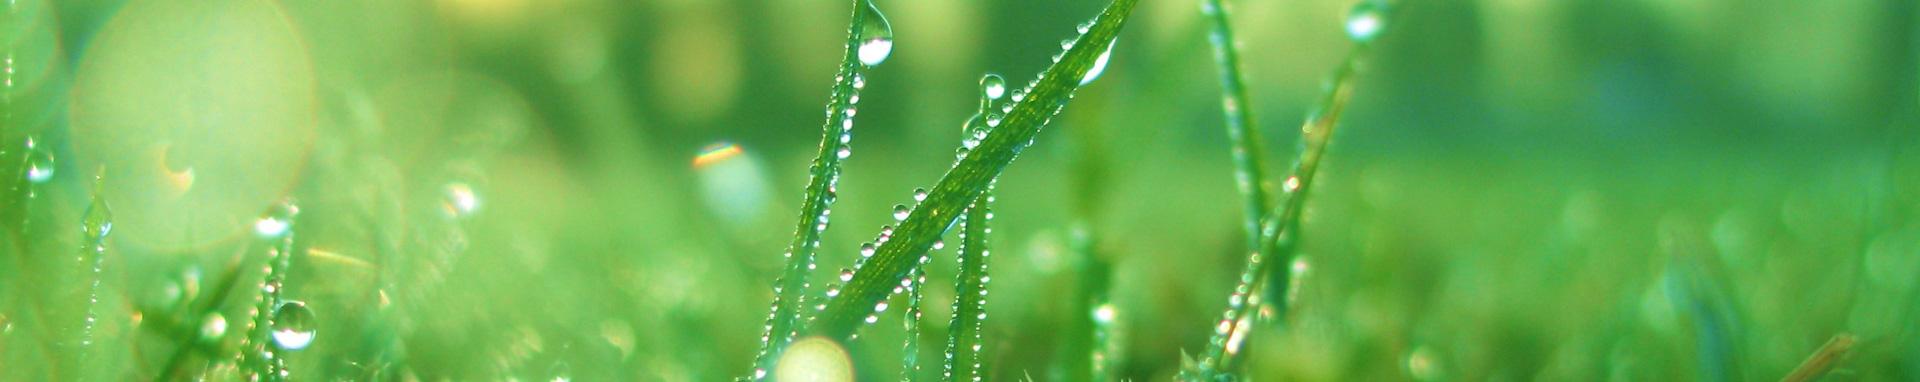 Irigatii agriprosolutions